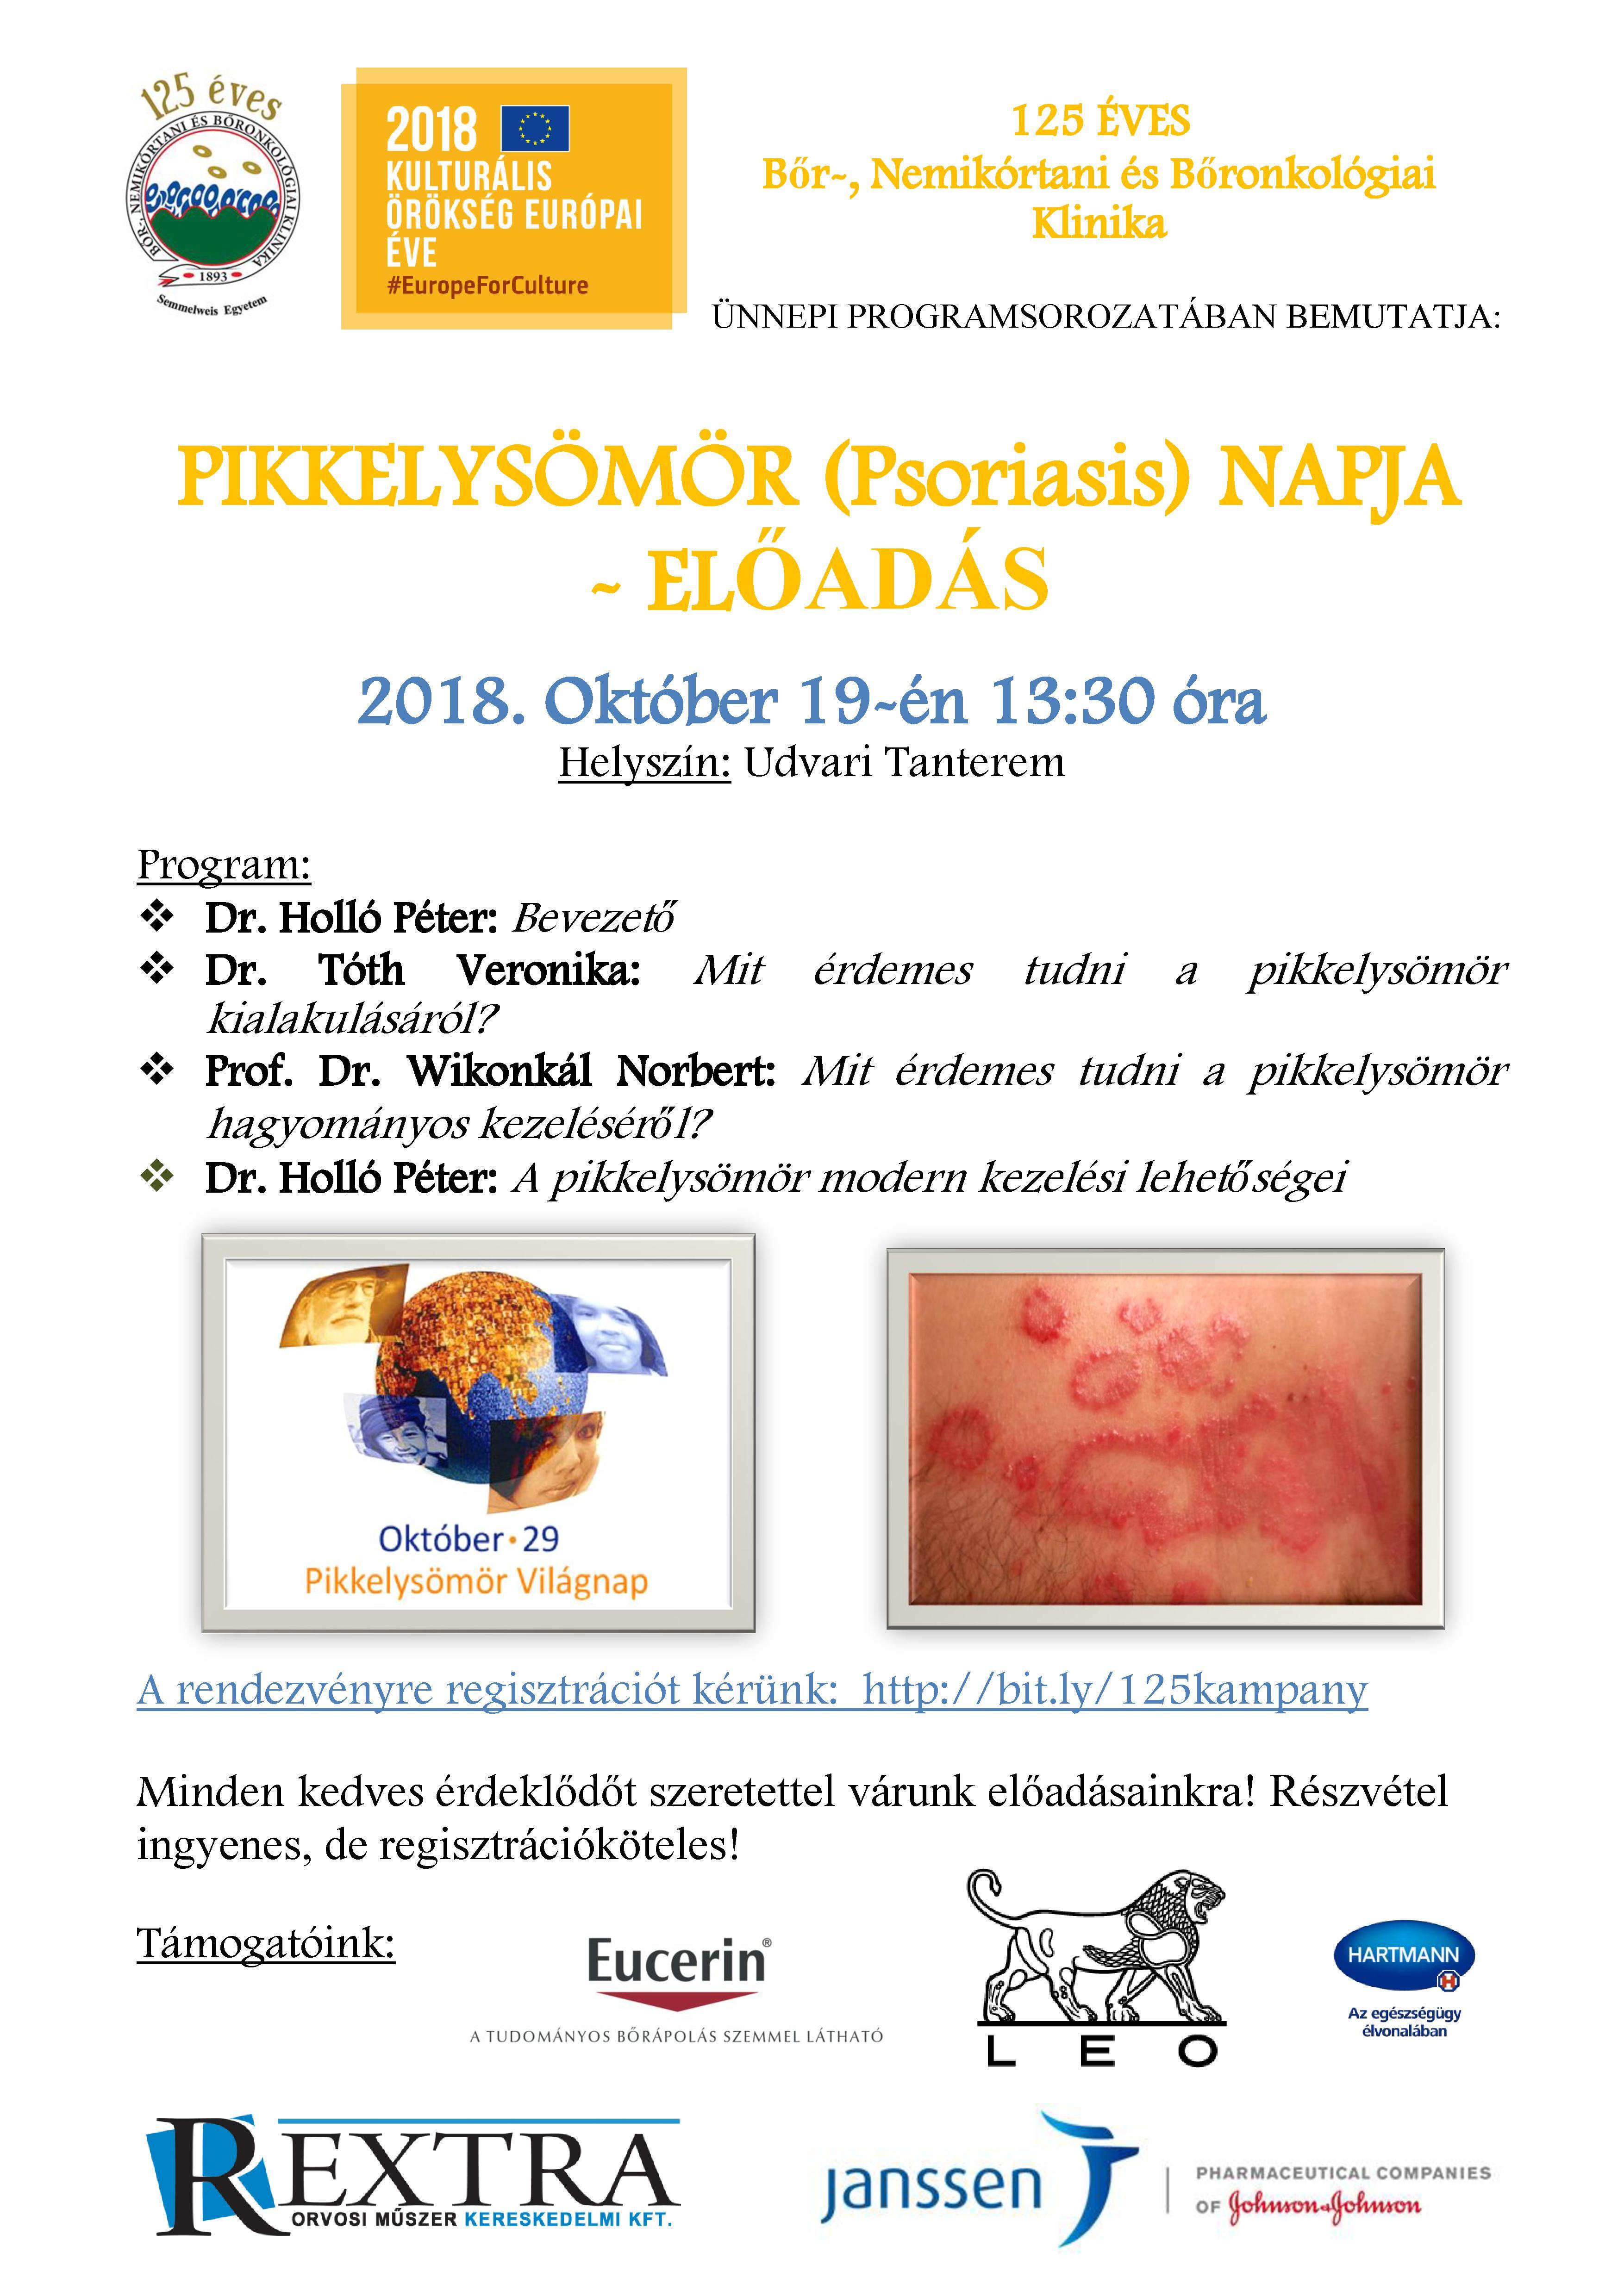 sunnymodell.hu - Pikkelysömörös betegek találkozója Budapesten - május